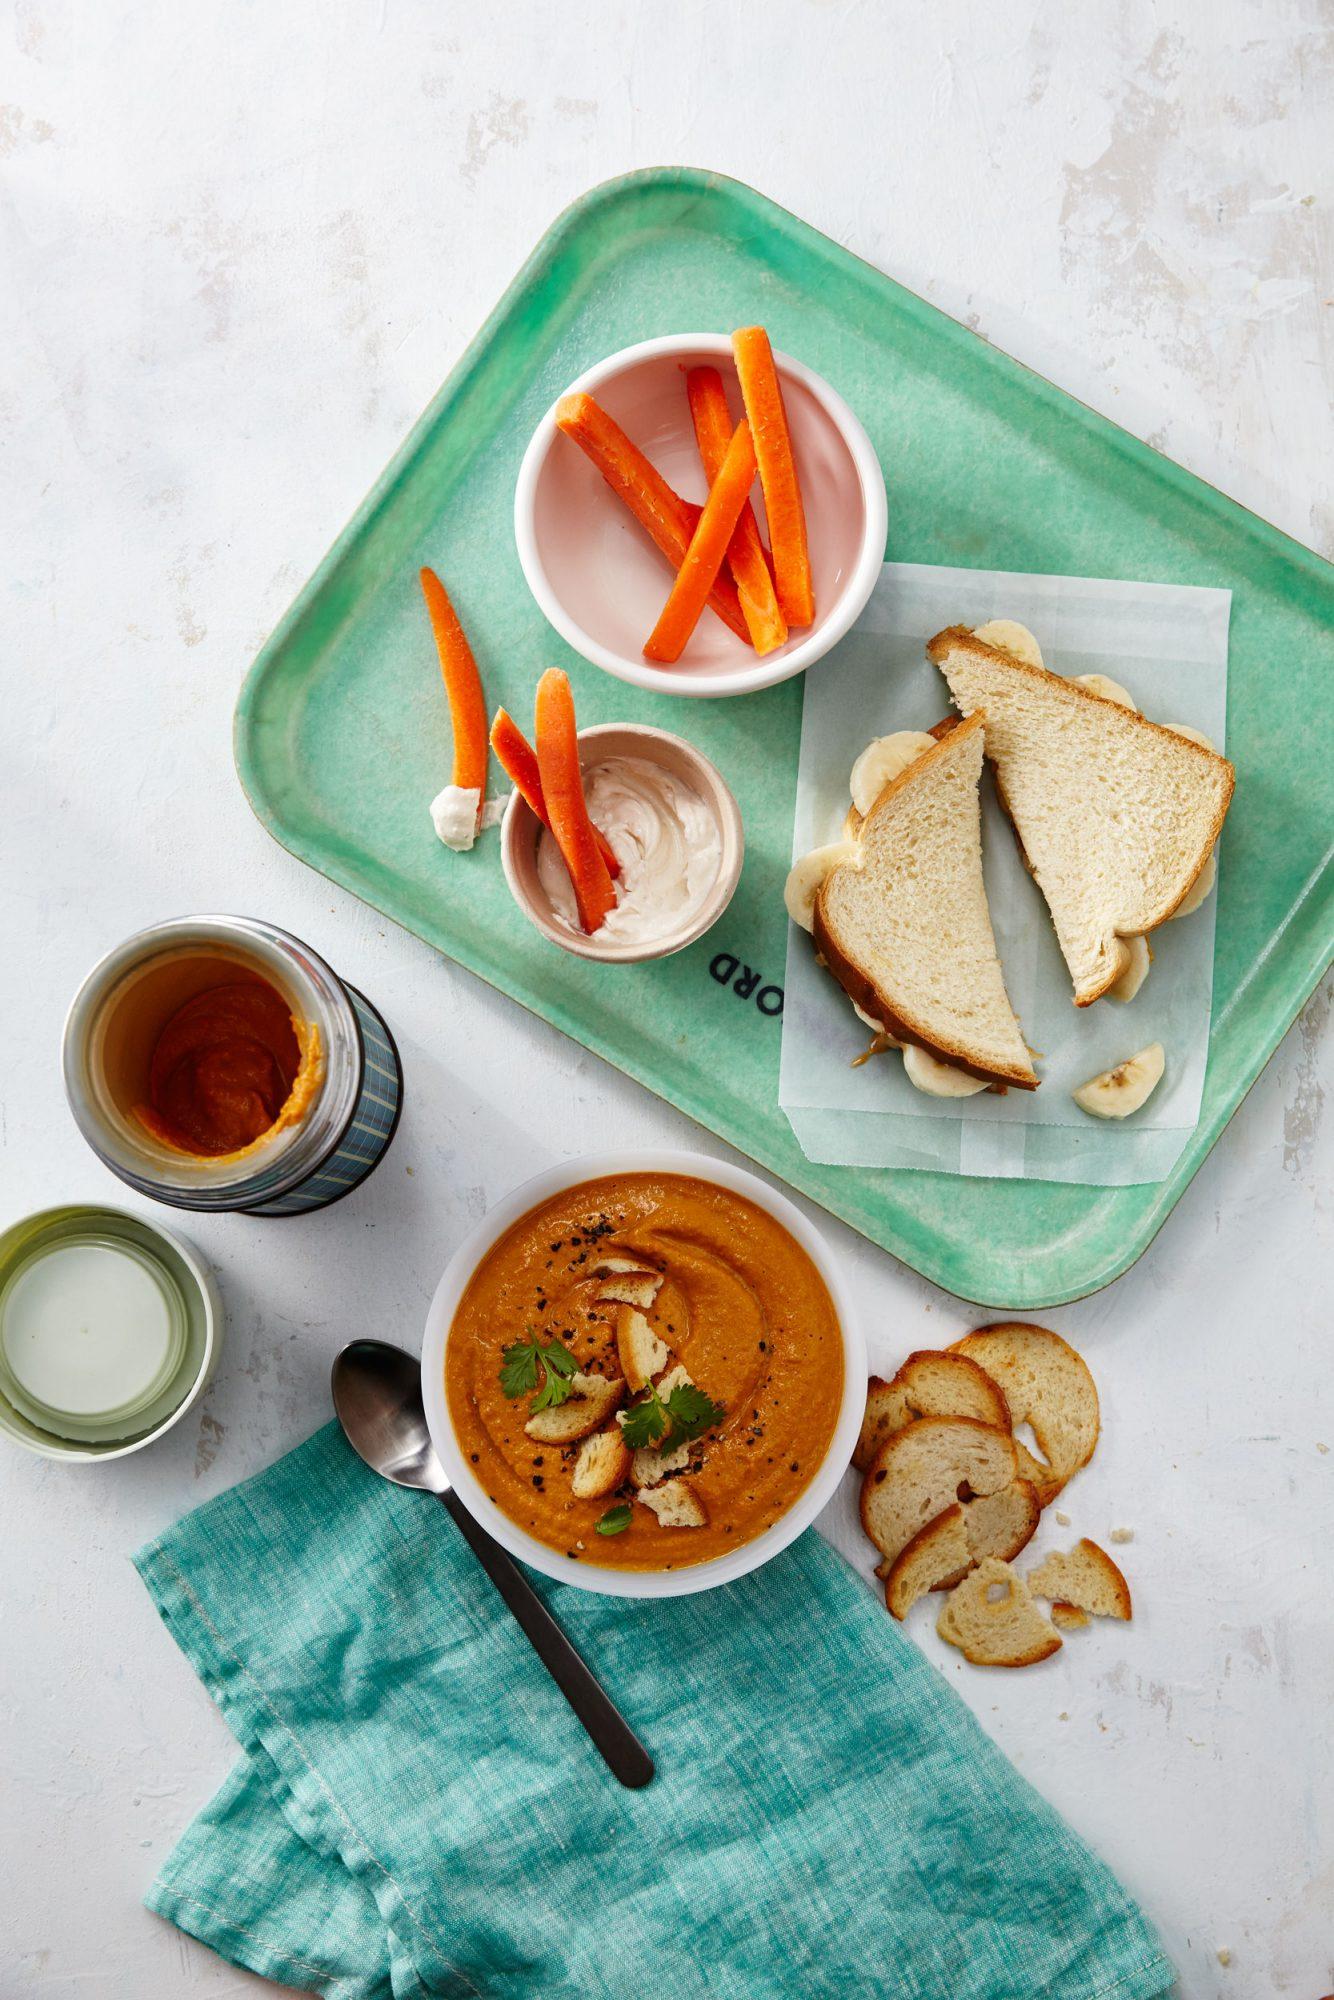 Gingered Carrot Cashew Soup/Cashew Butter Banana Sandwich image